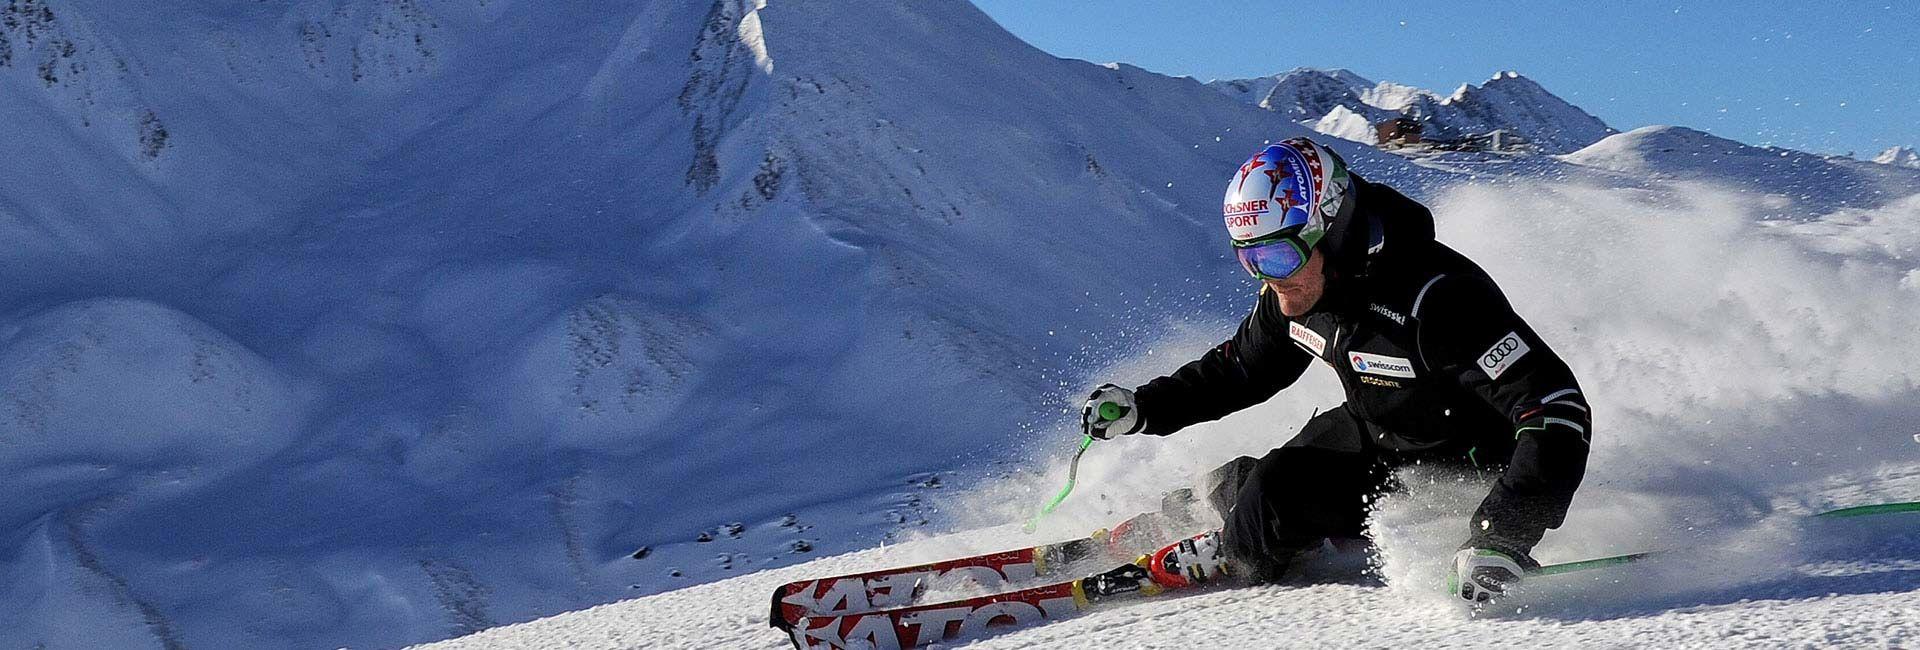 Samnaun Skiurlaub Pauschale Hauptsaison Hotel Romantica